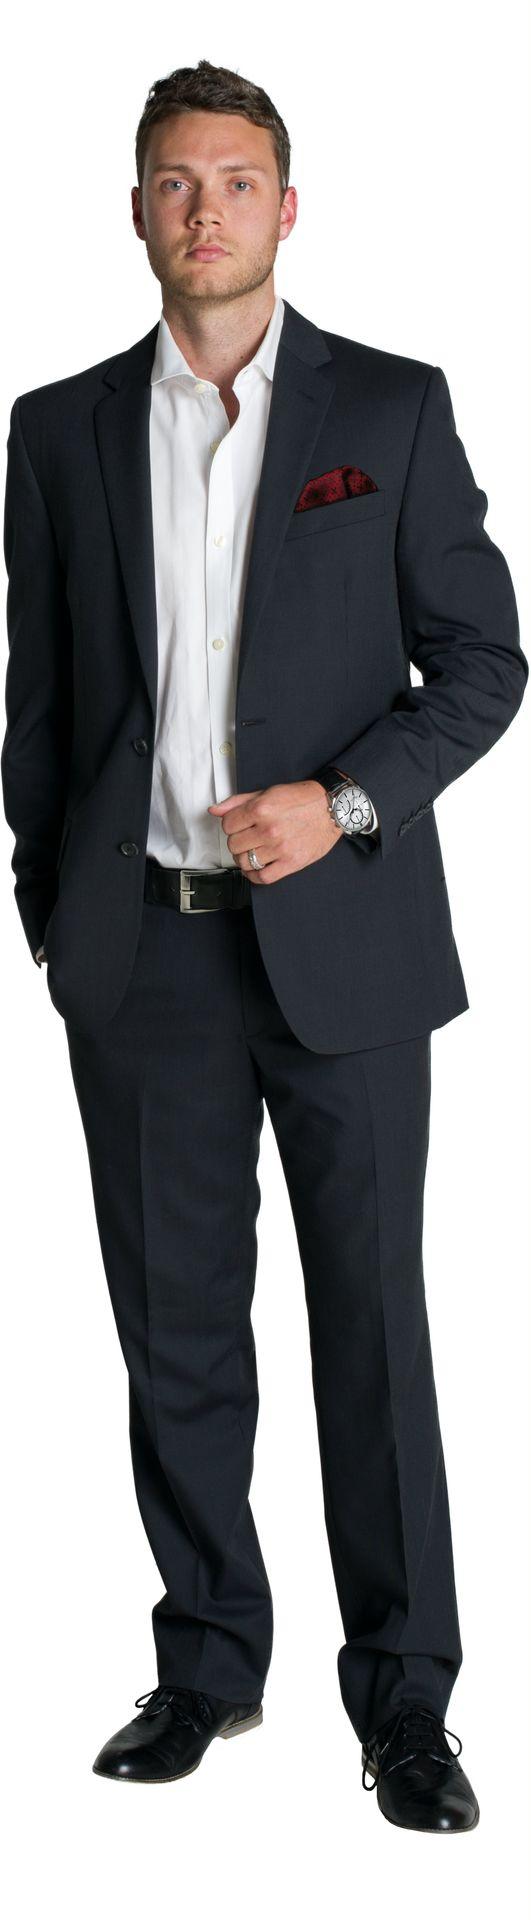 body1-business